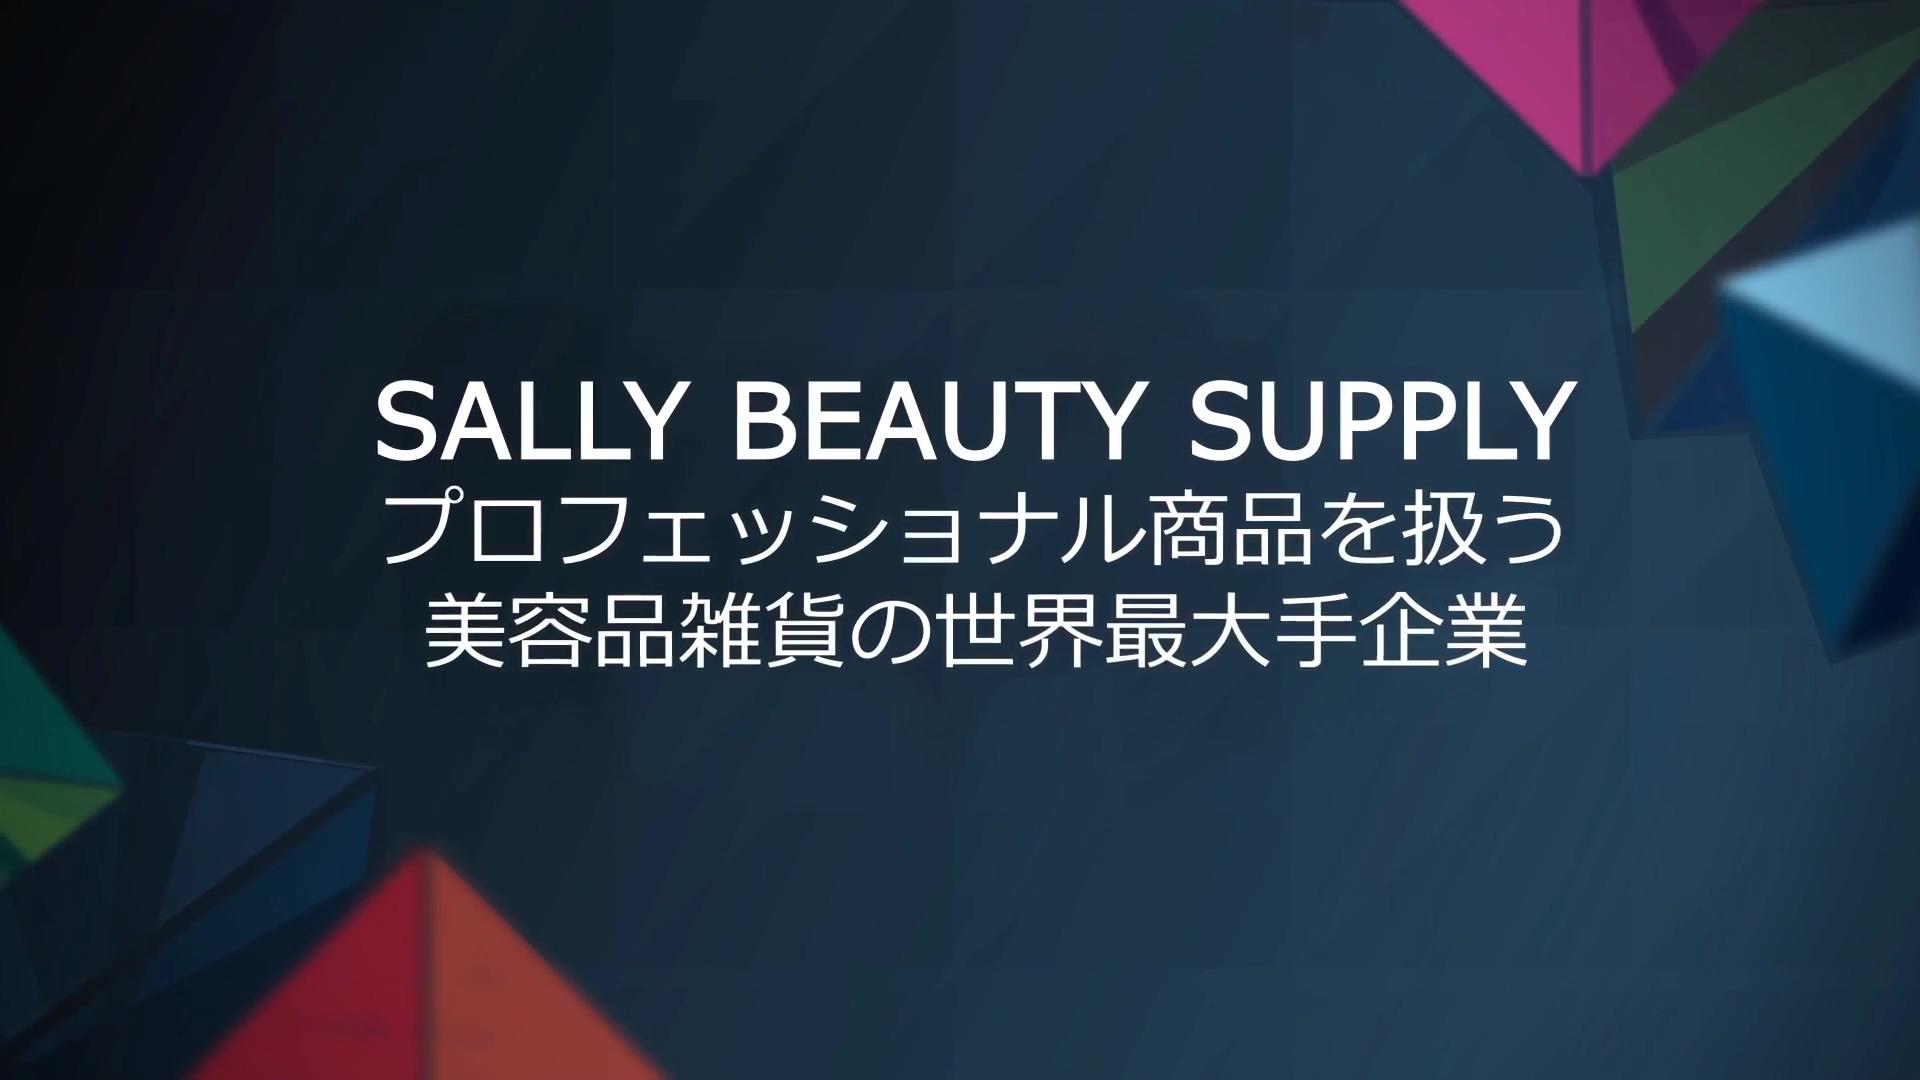 Sally Beauty(米美容品雑貨大手)